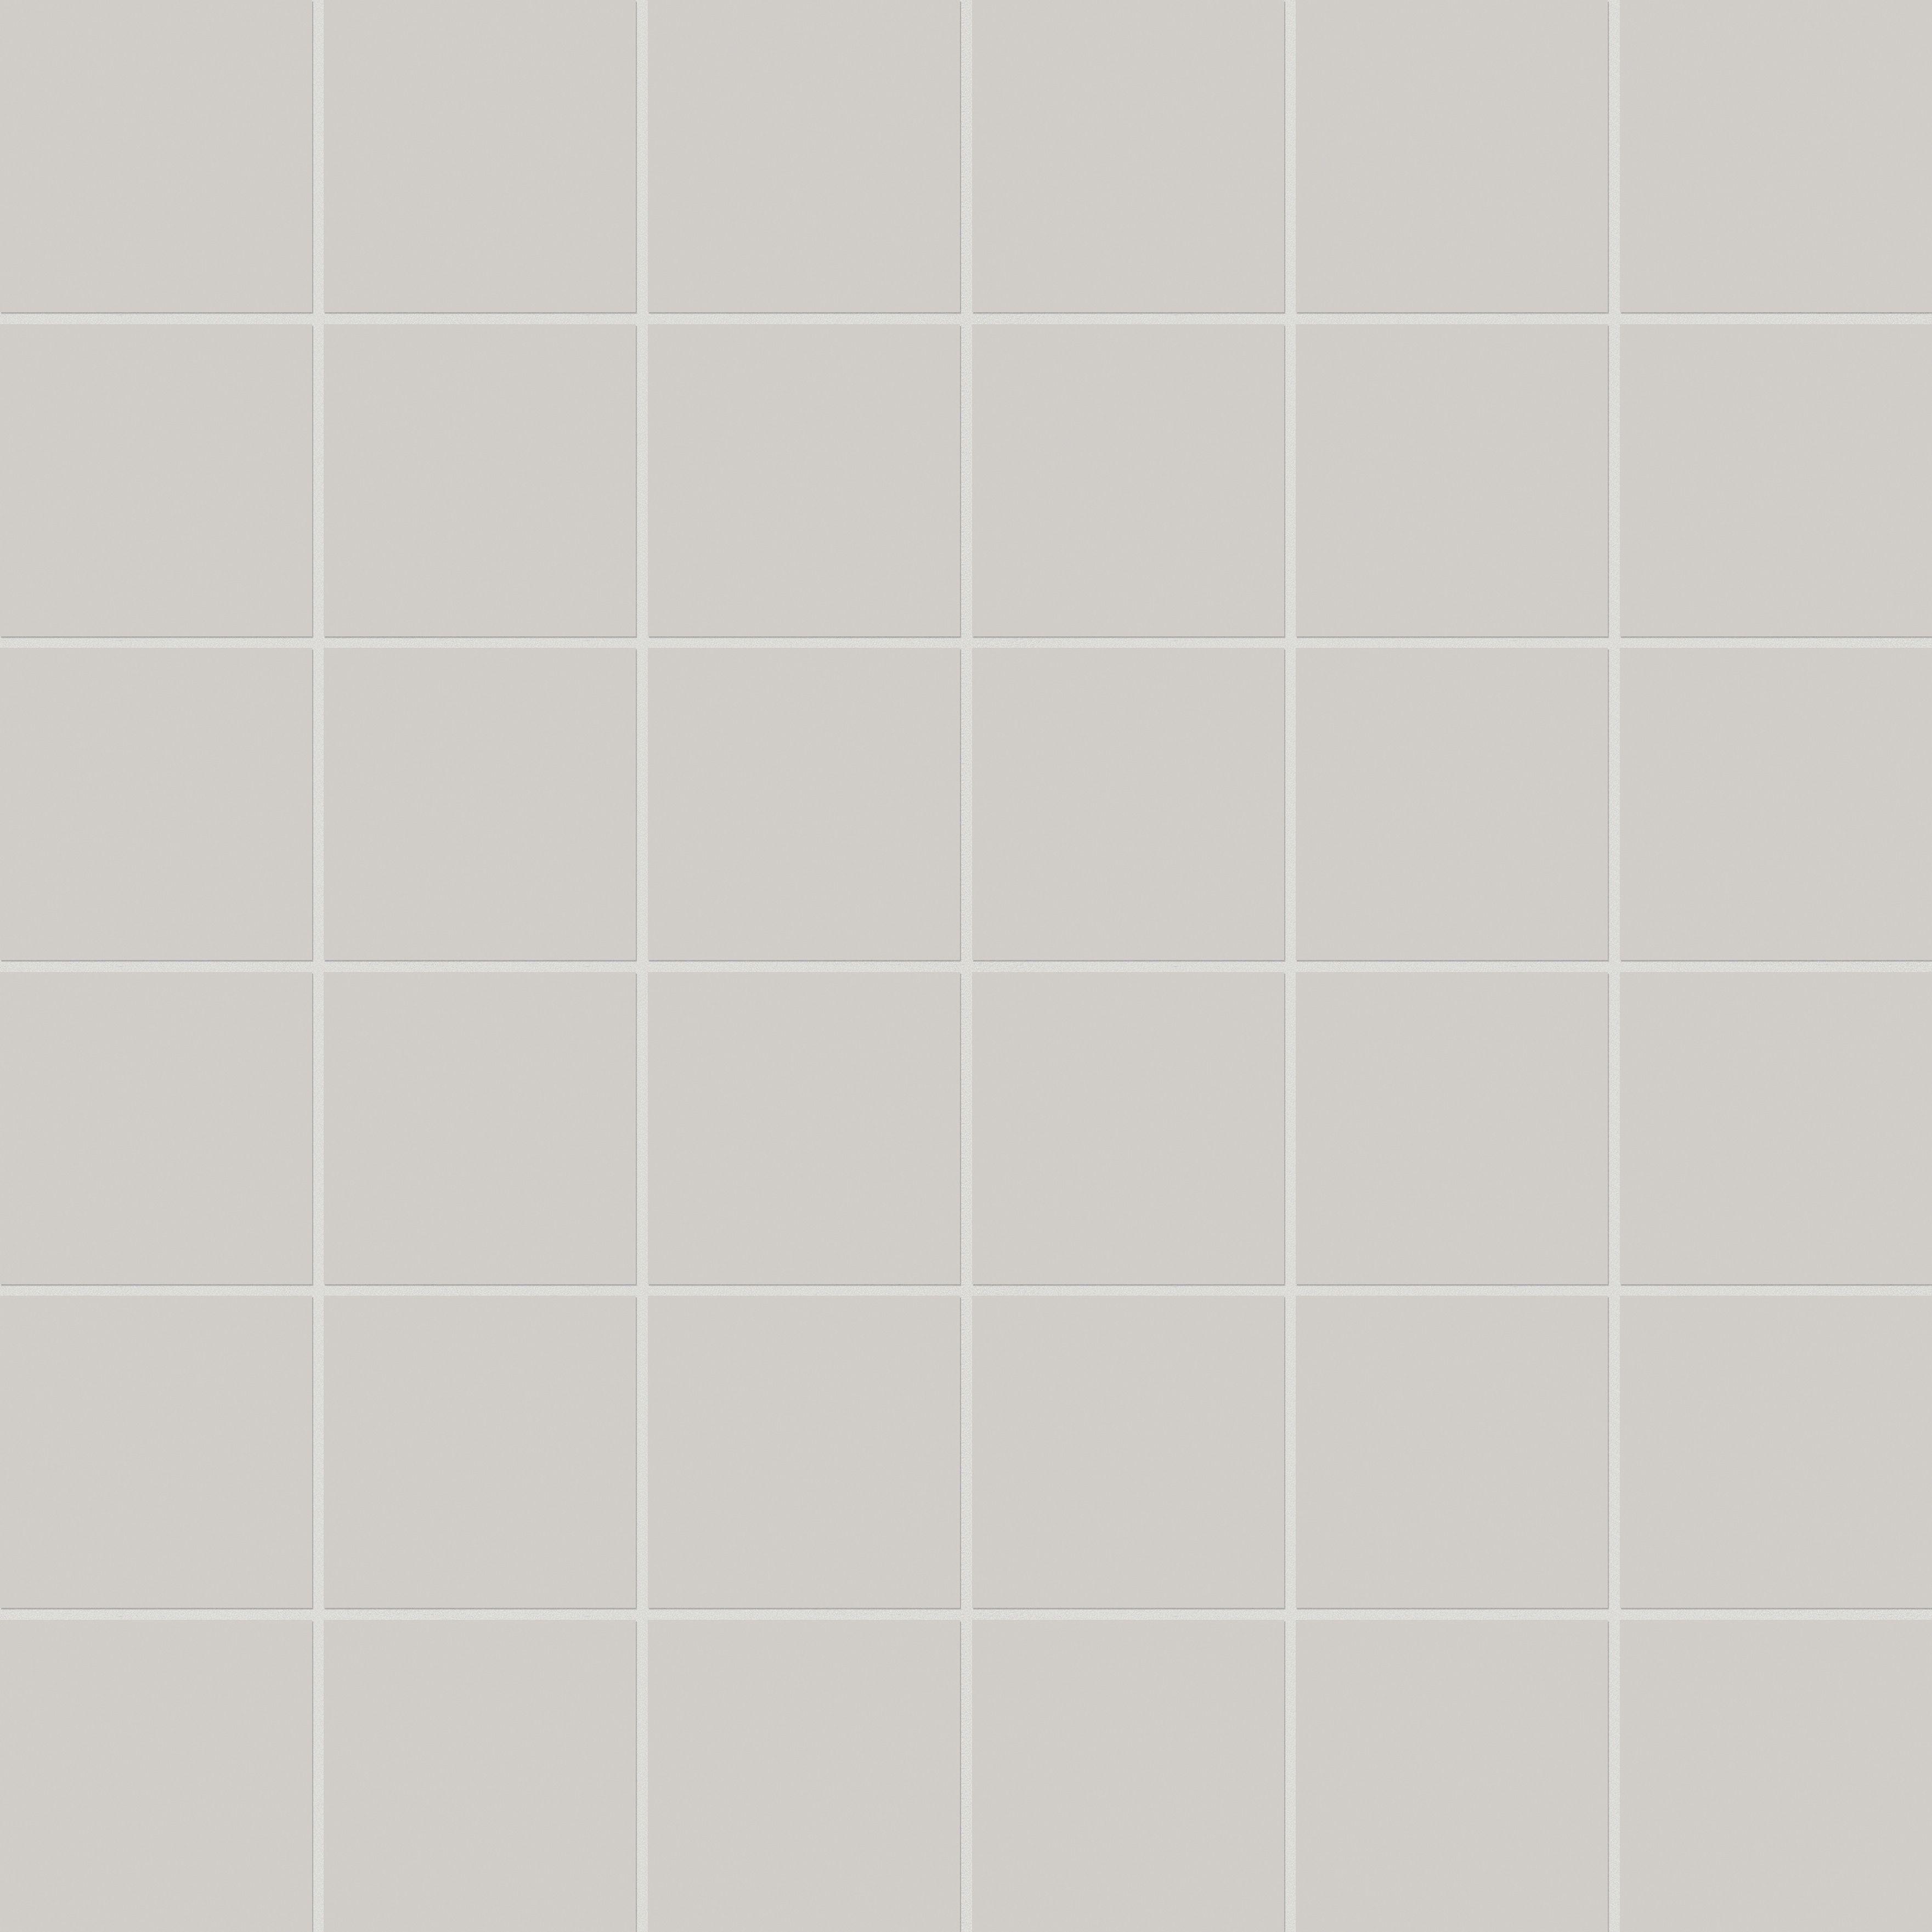 Warm grey 2x2 mosaic mosaic gray grey ceramic tile soho warm grey 2x2 mosaic mosaic gray grey ceramic tile dailygadgetfo Choice Image